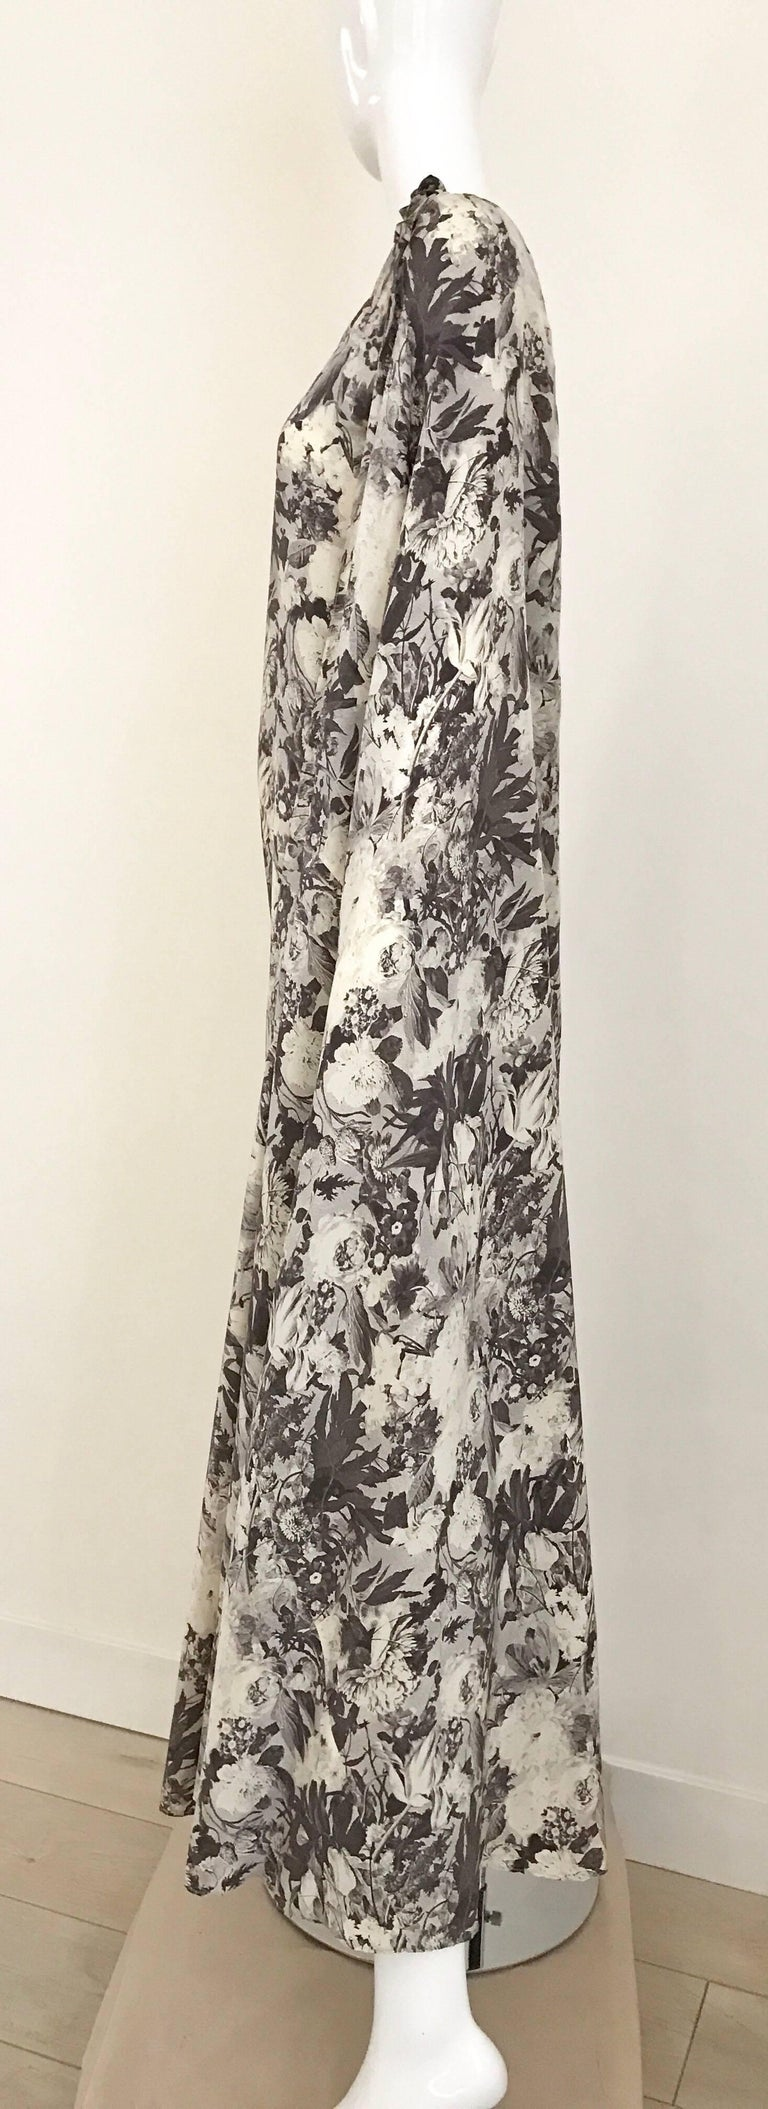 Jean Patou Grey Floral Print One Shoulder Silk Dress, 1970s  For Sale 1